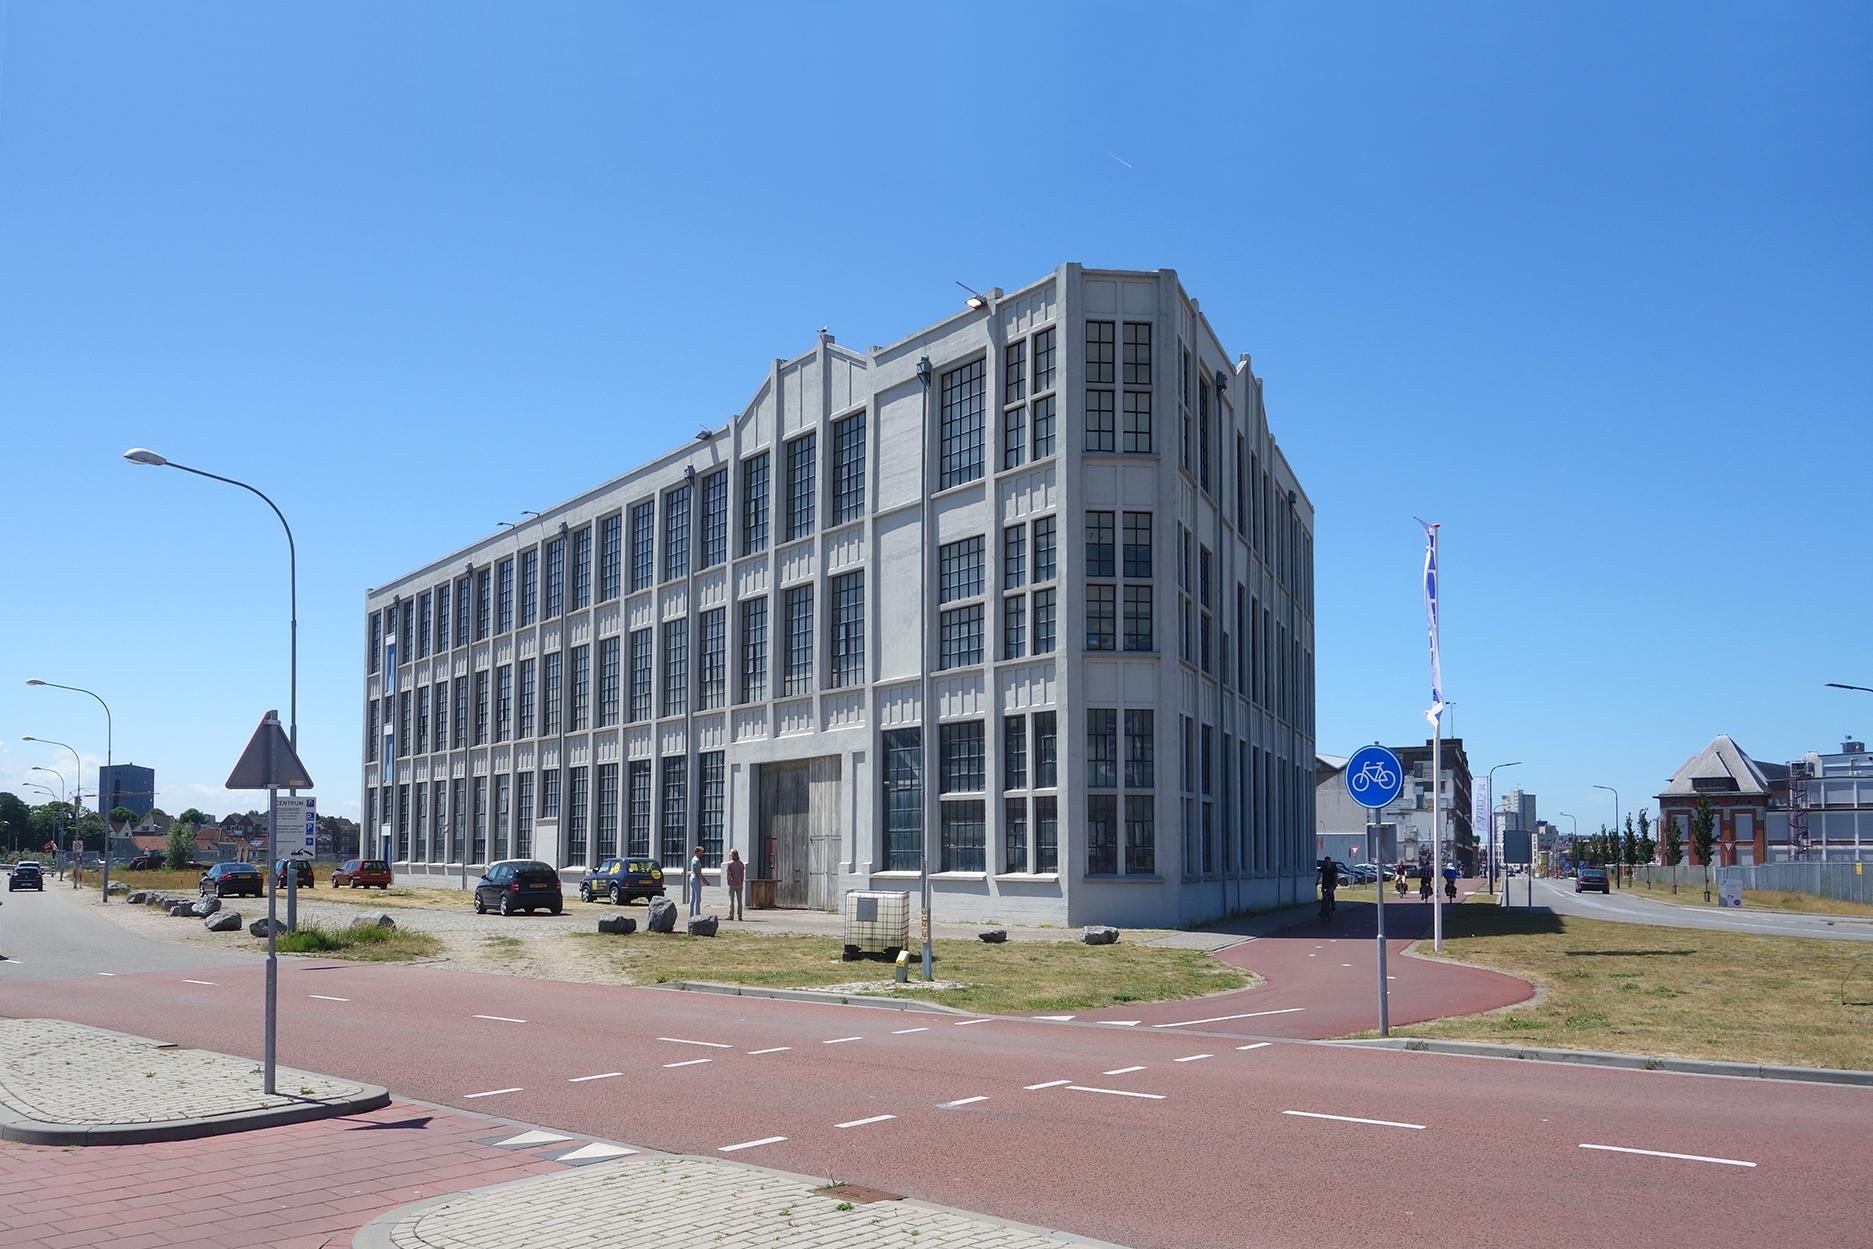 Timmerfabriek.jpg